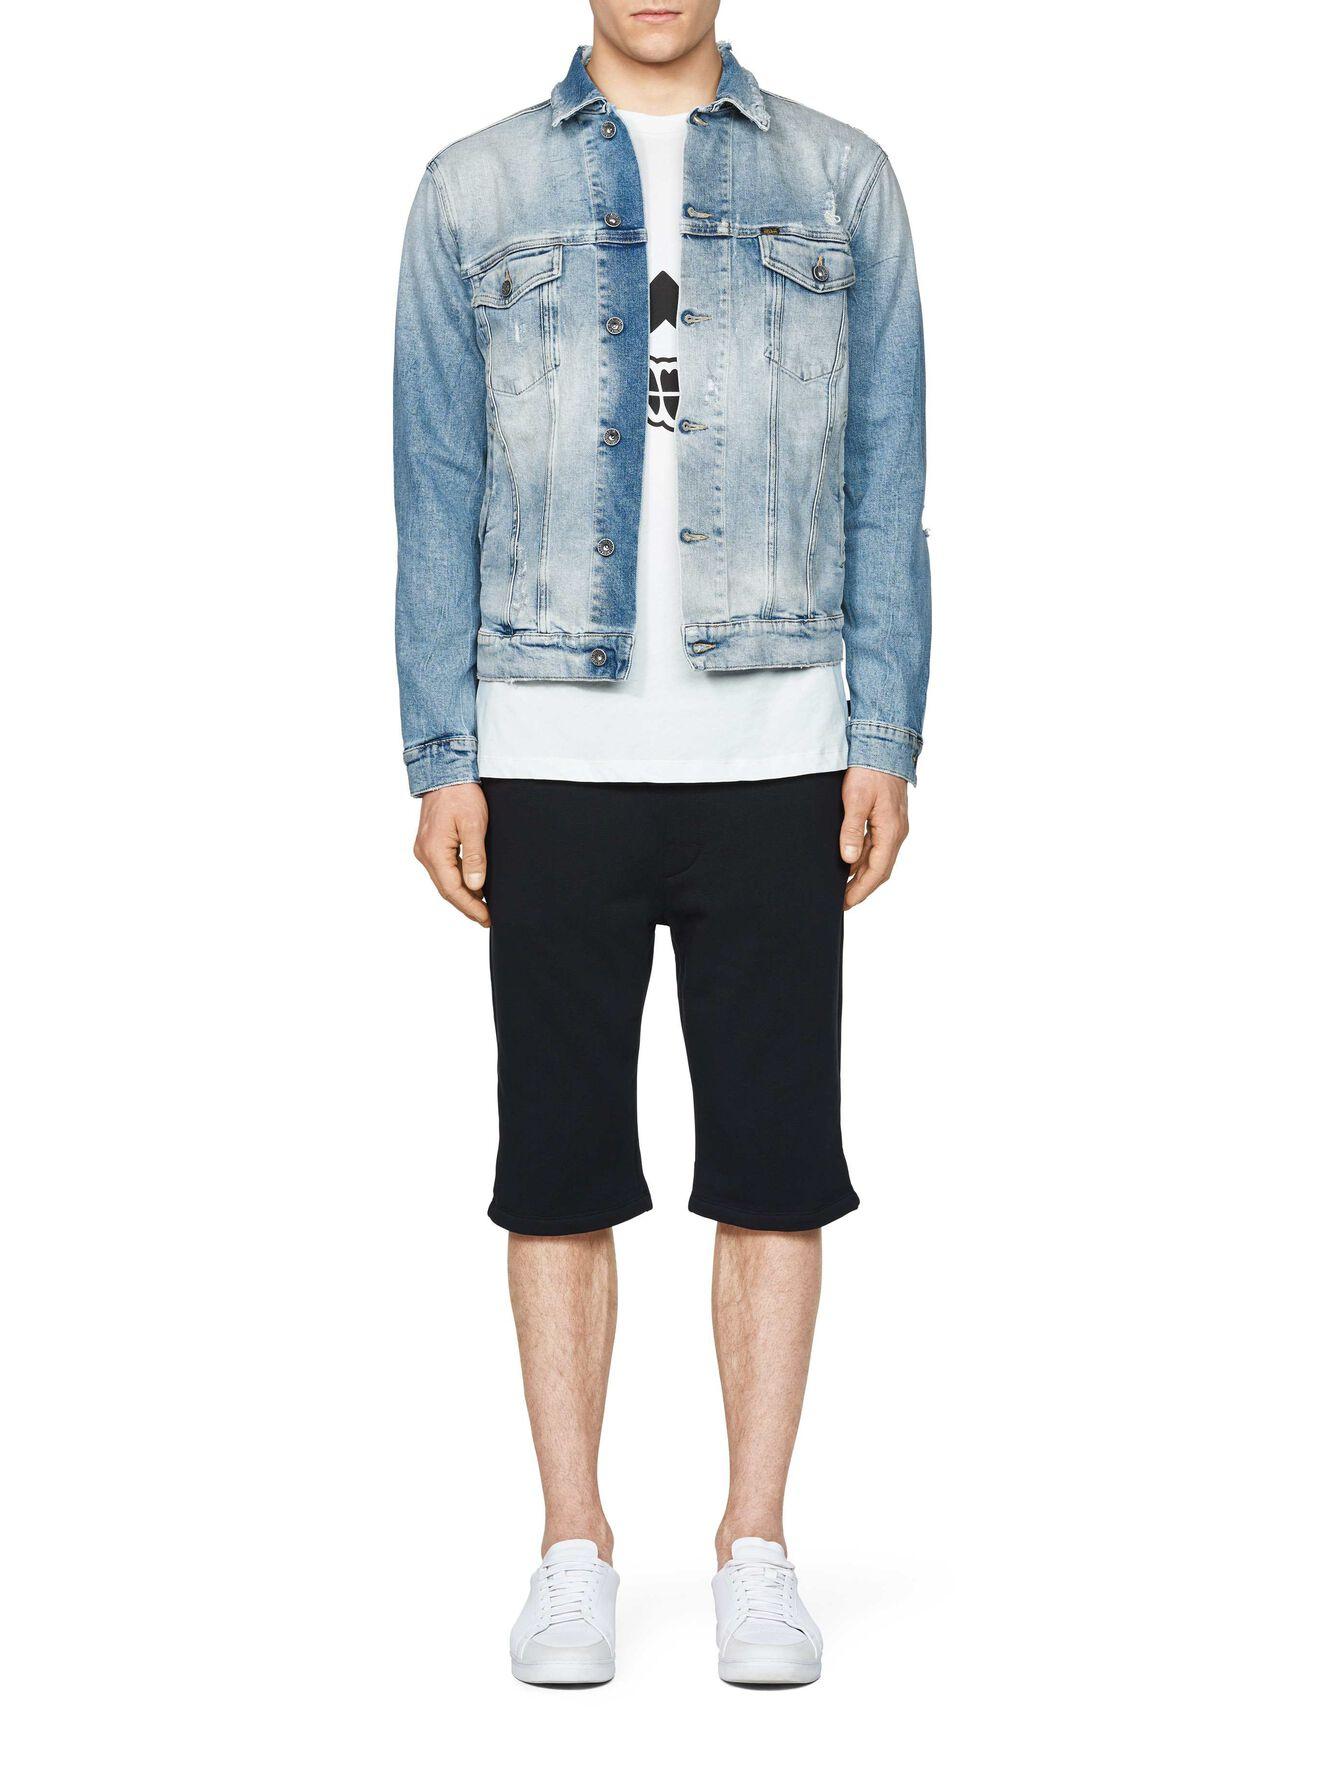 967b0a40 Primal denim jacket in Pale Jeans Blue from Tiger of Sweden ...